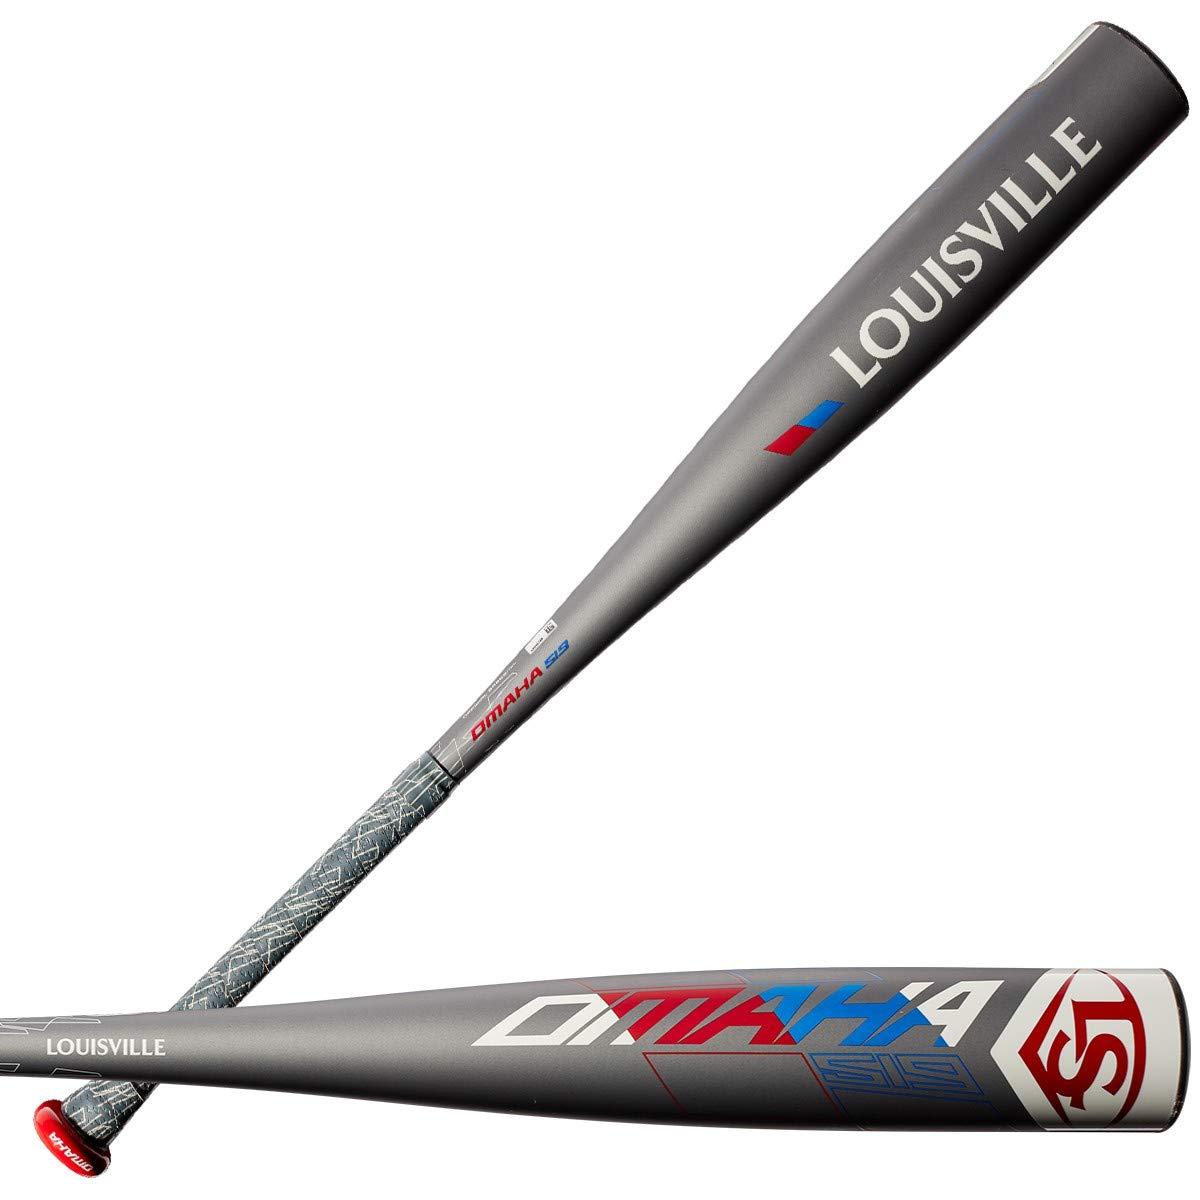 louisville-slugger-2019-omaha-519-5-2-5-8-senior-league-baseball-bat-31-inch-26-oz WTLSLO519B531 Louisville 887768729943 Meets USSSA 1.15 bpf standard; 7/8 inch tapered handle 1-piece ST